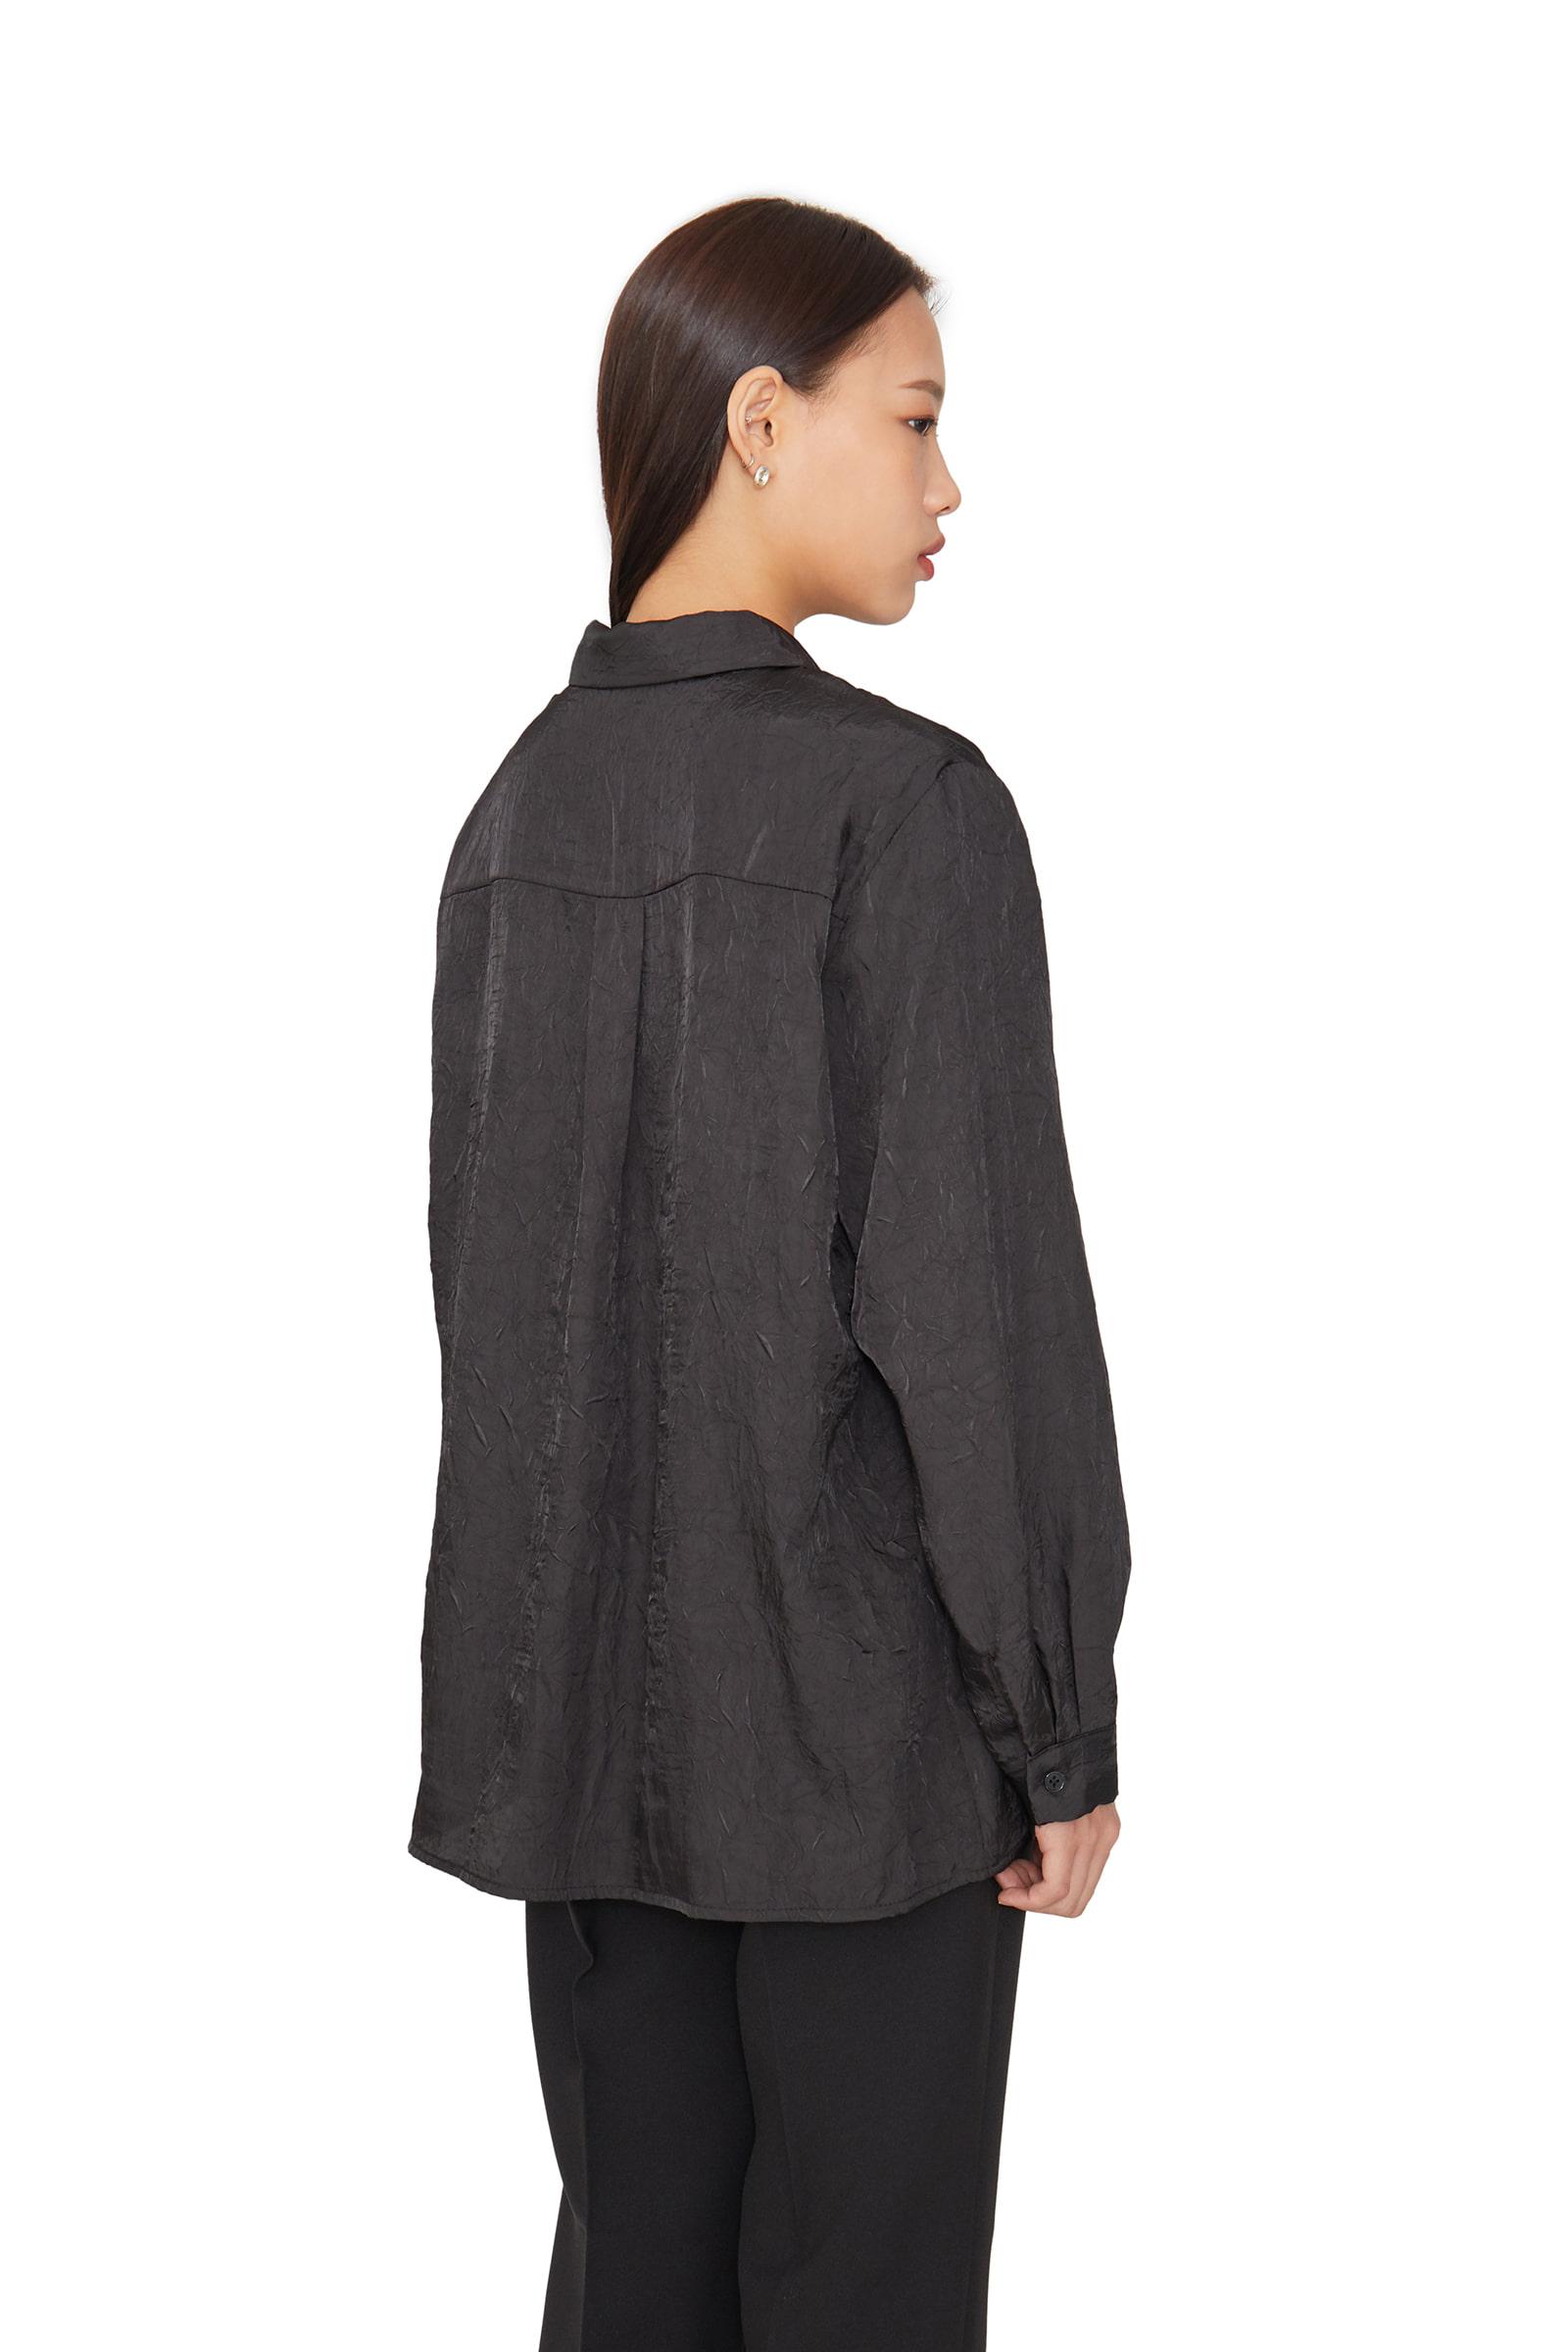 Satin crease textured shirt